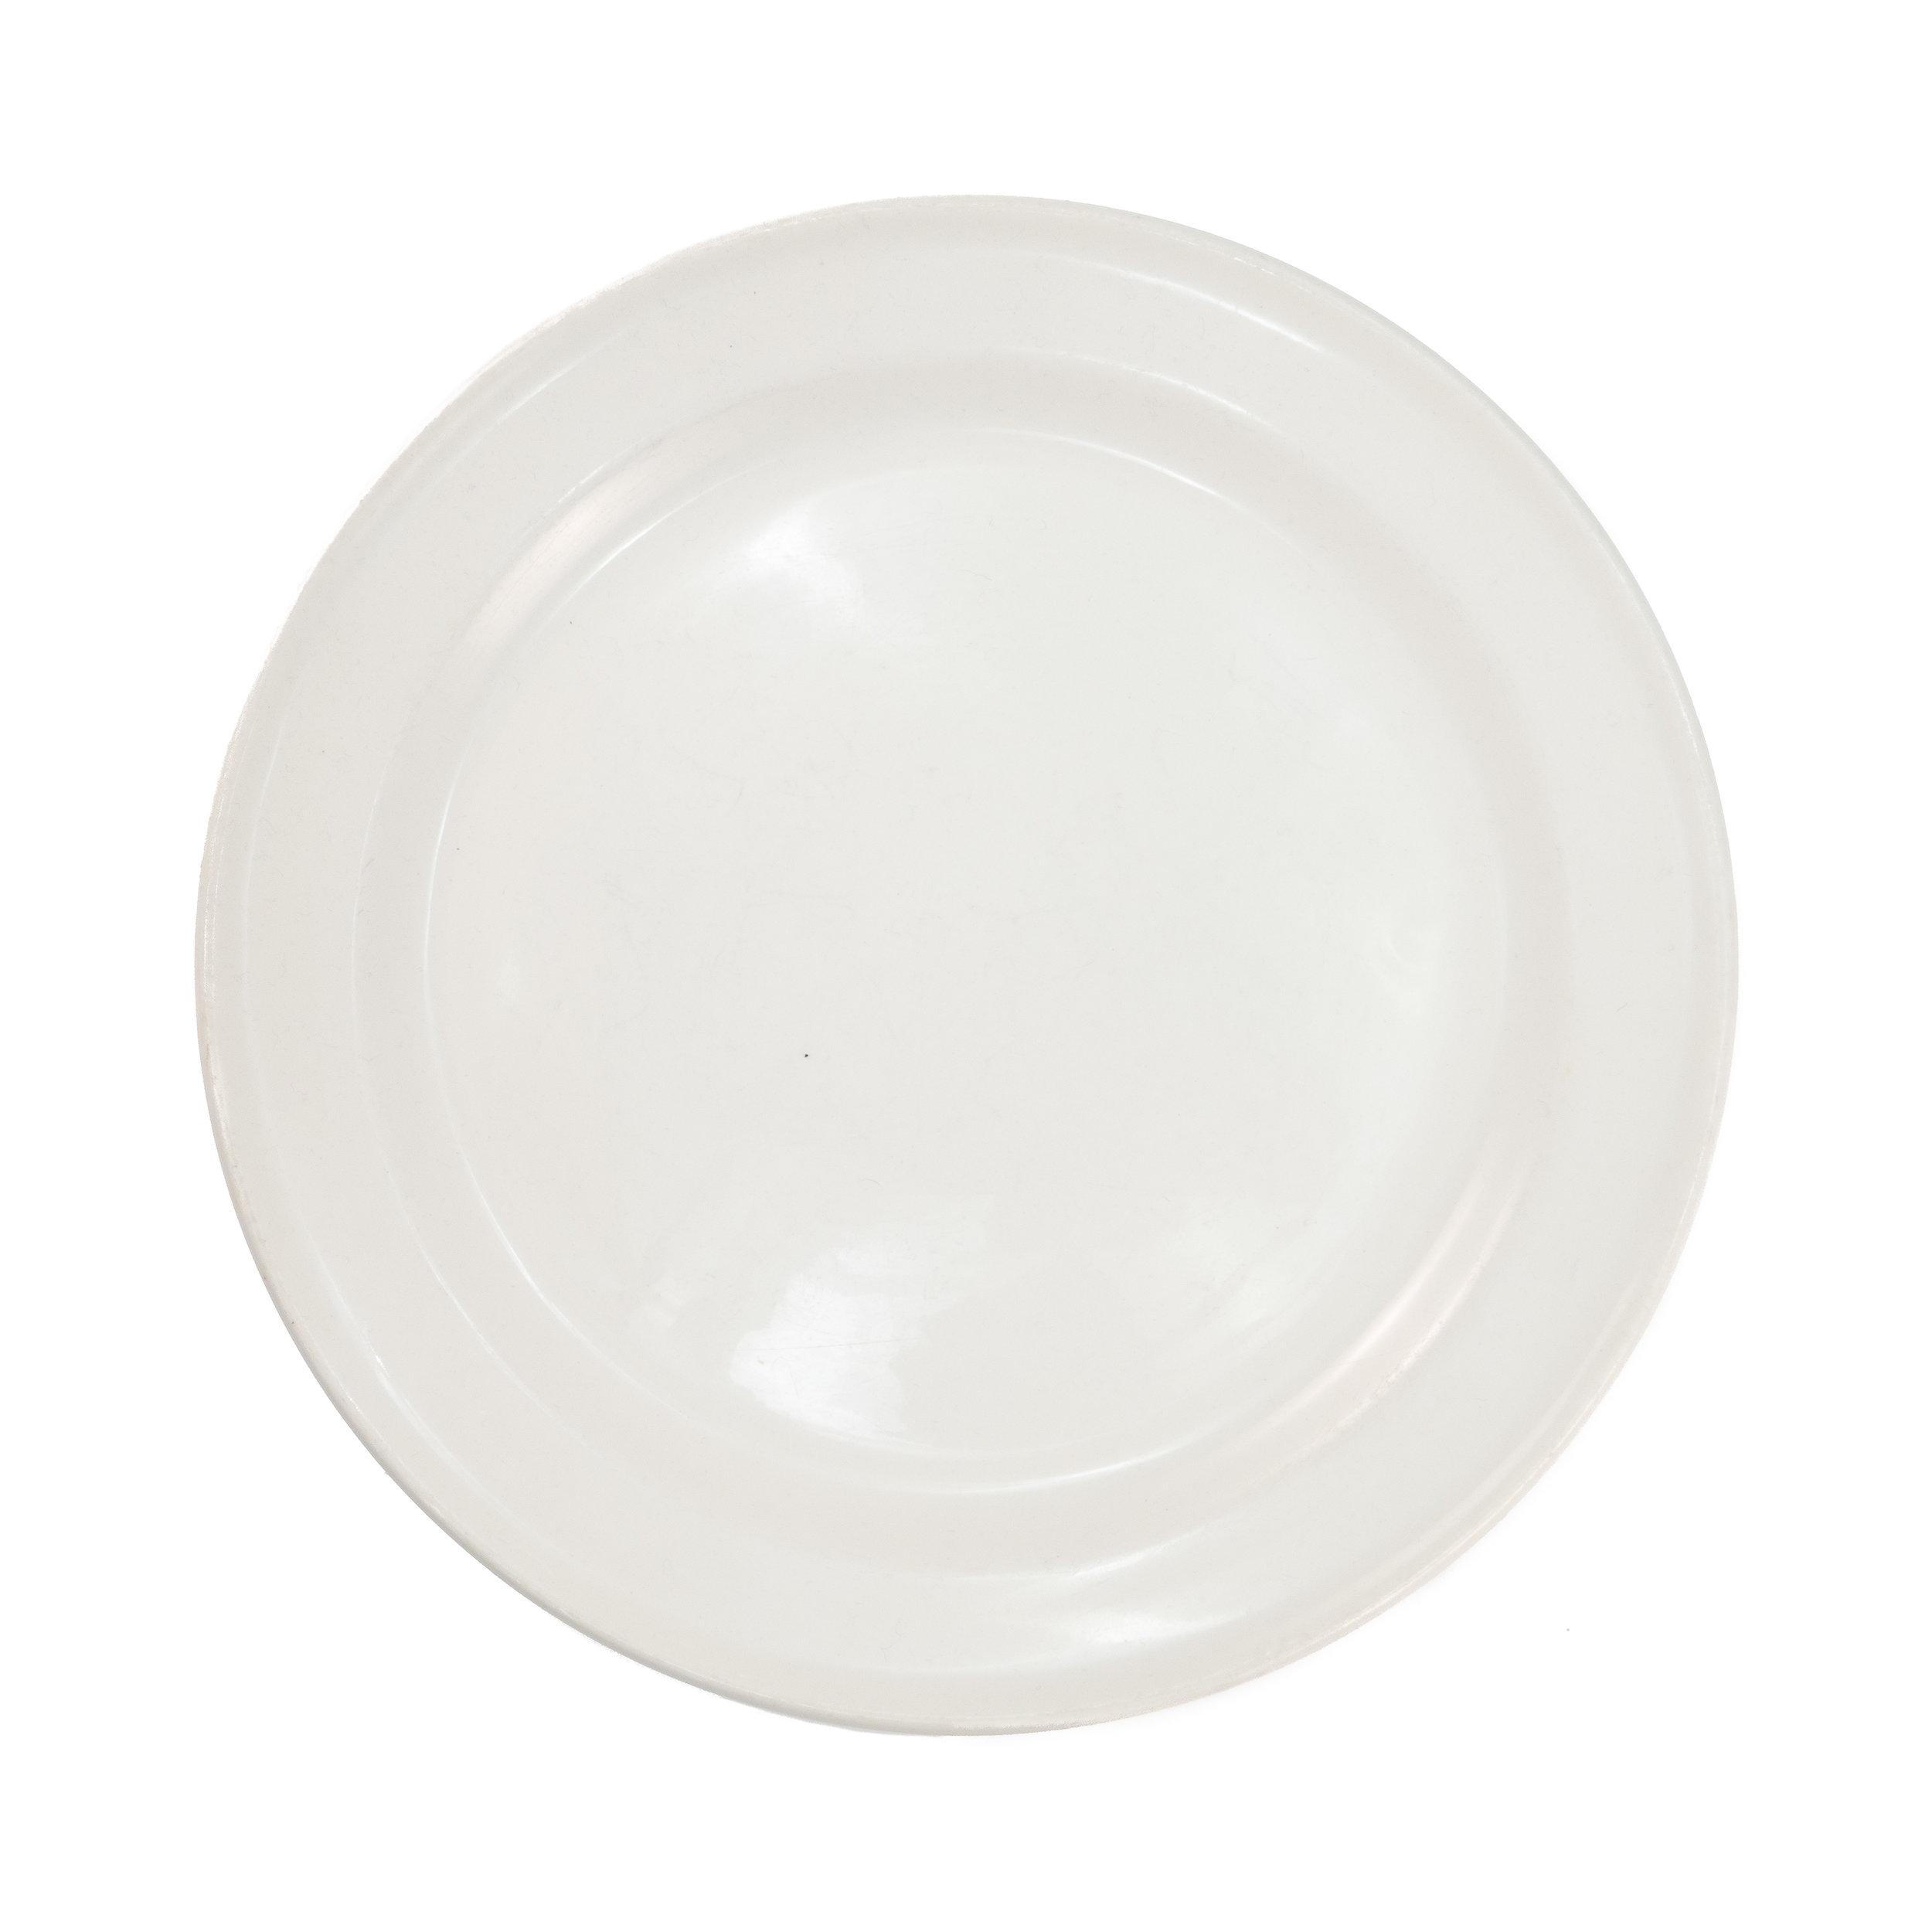 Dinner Plate (Ikea)